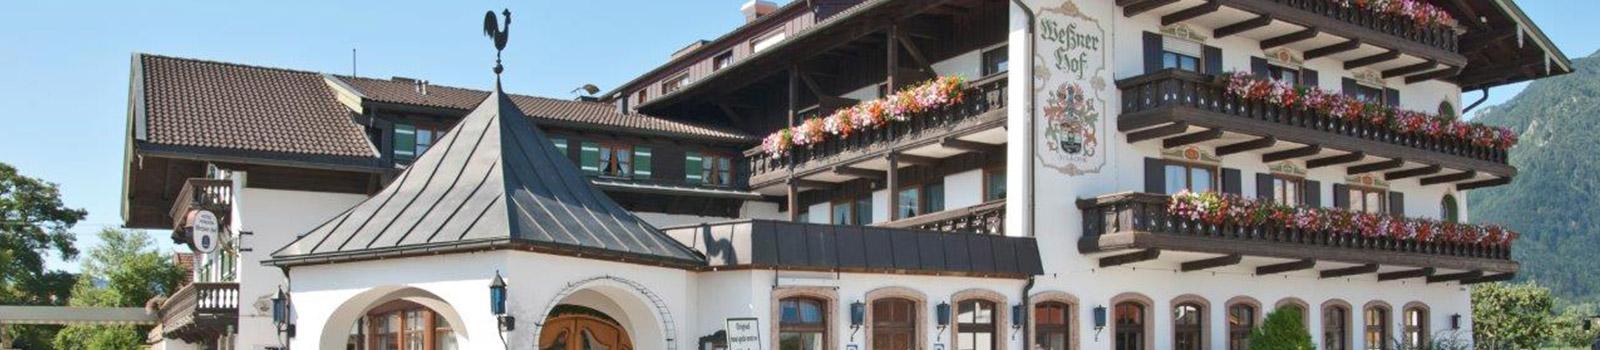 Hotel Restaurant Weßner Hof